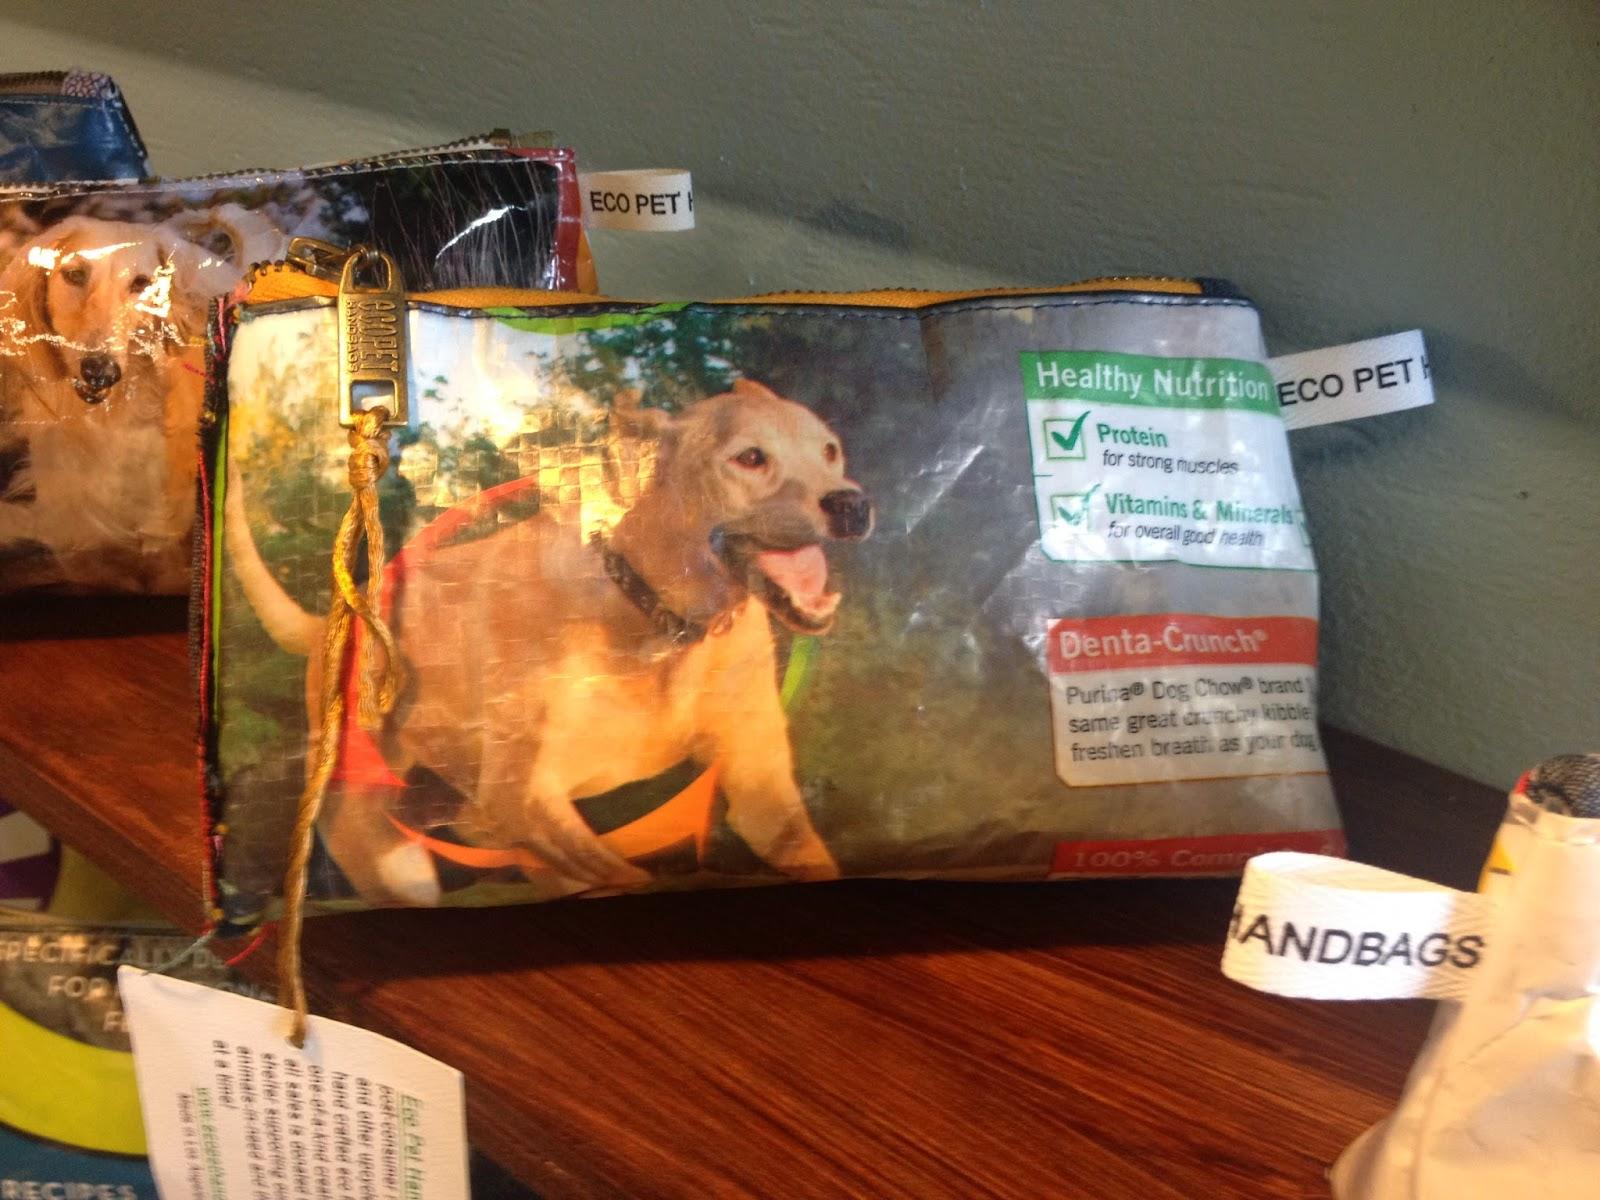 Eco Pet Handbags